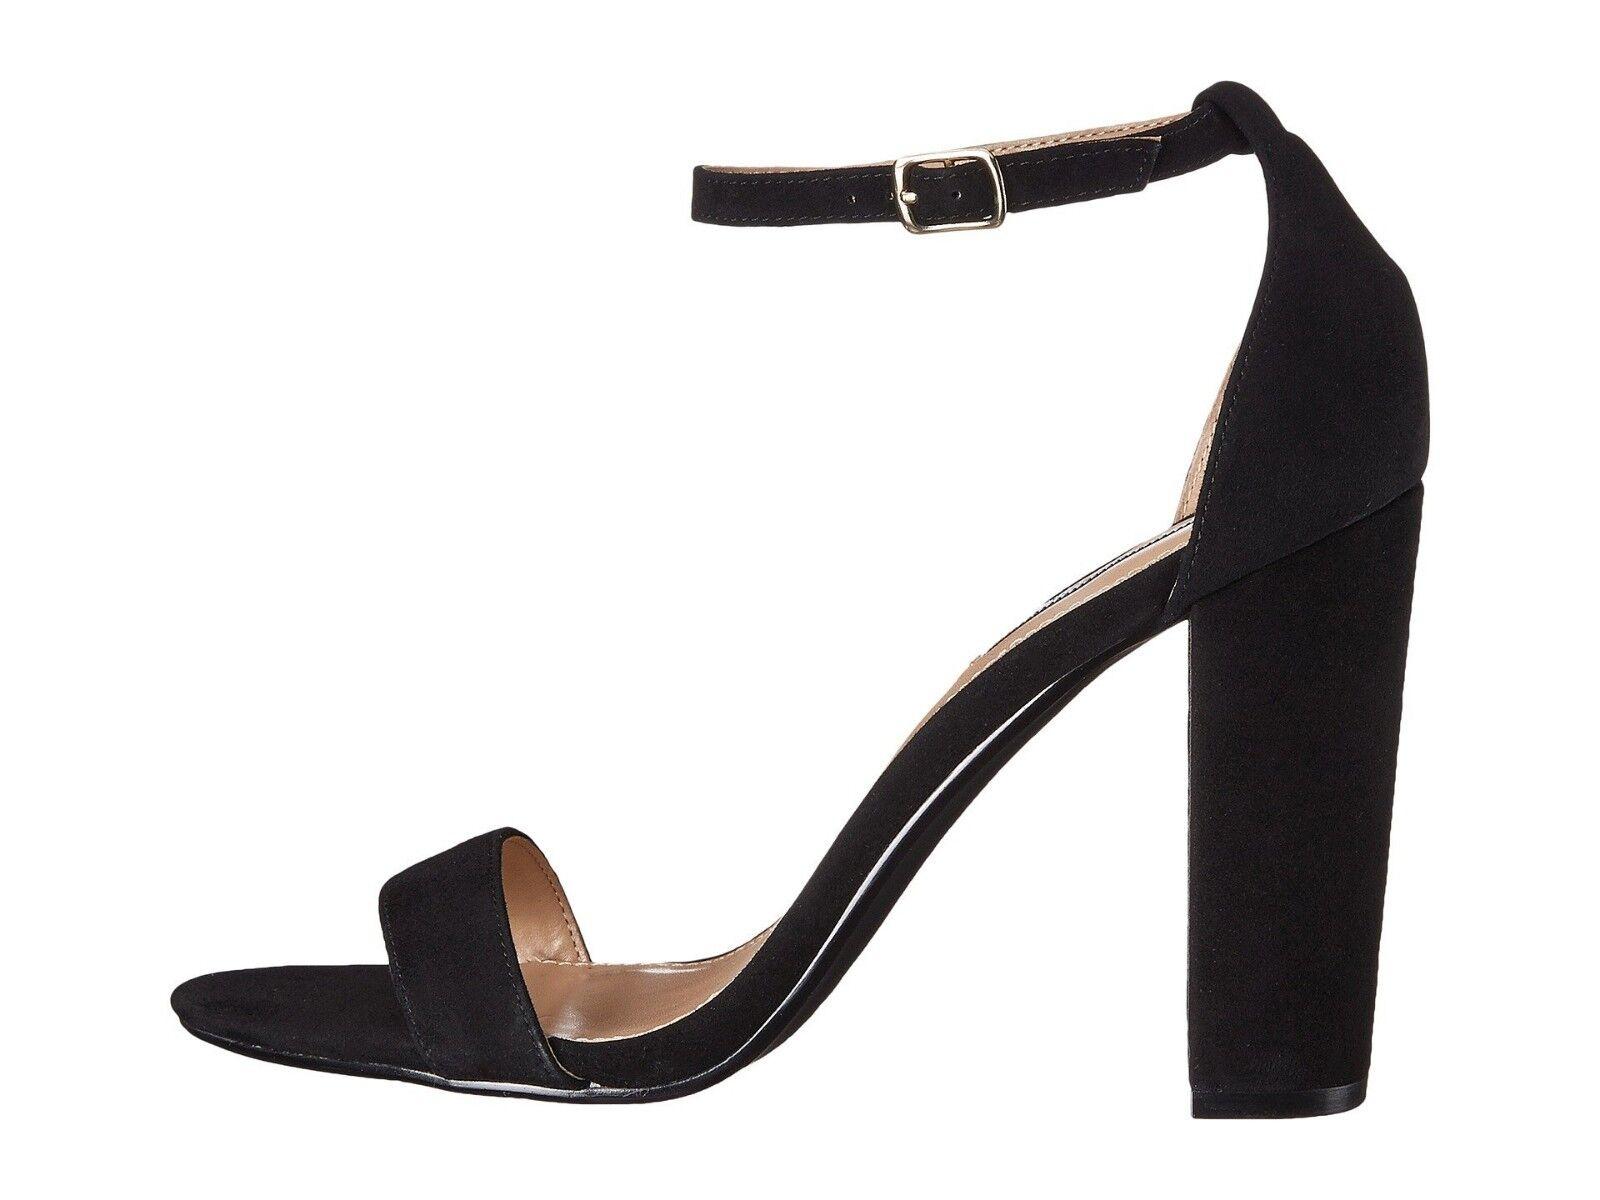 outlet online Steve Madden Madden Madden CARRSON nero Suede Donna  Open Toe Block Heel Sandals  confortevole